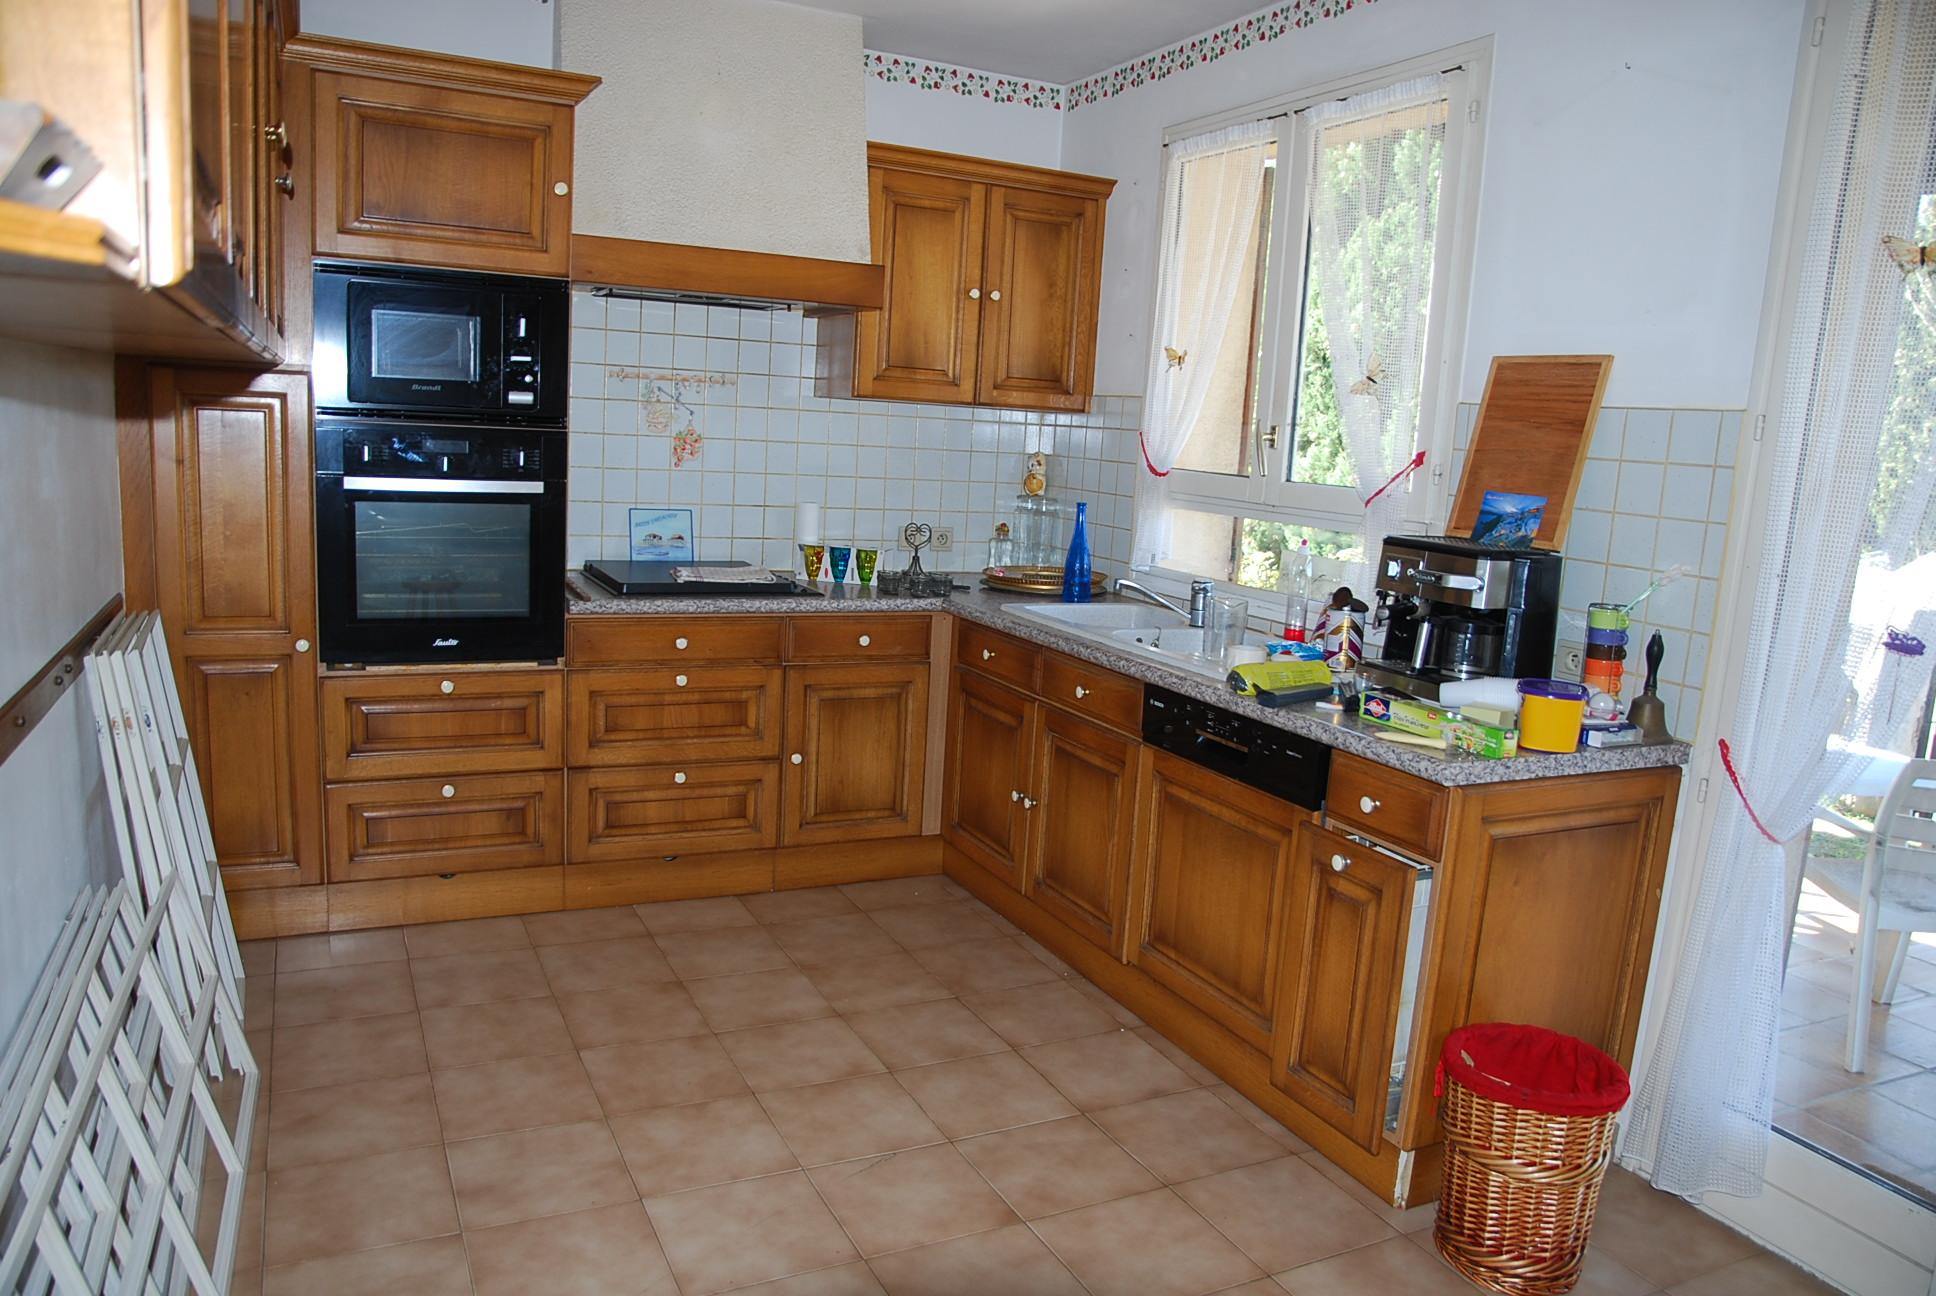 Vente villa martigues jonqui res n rb69467 immobilier for Garage htm marignane